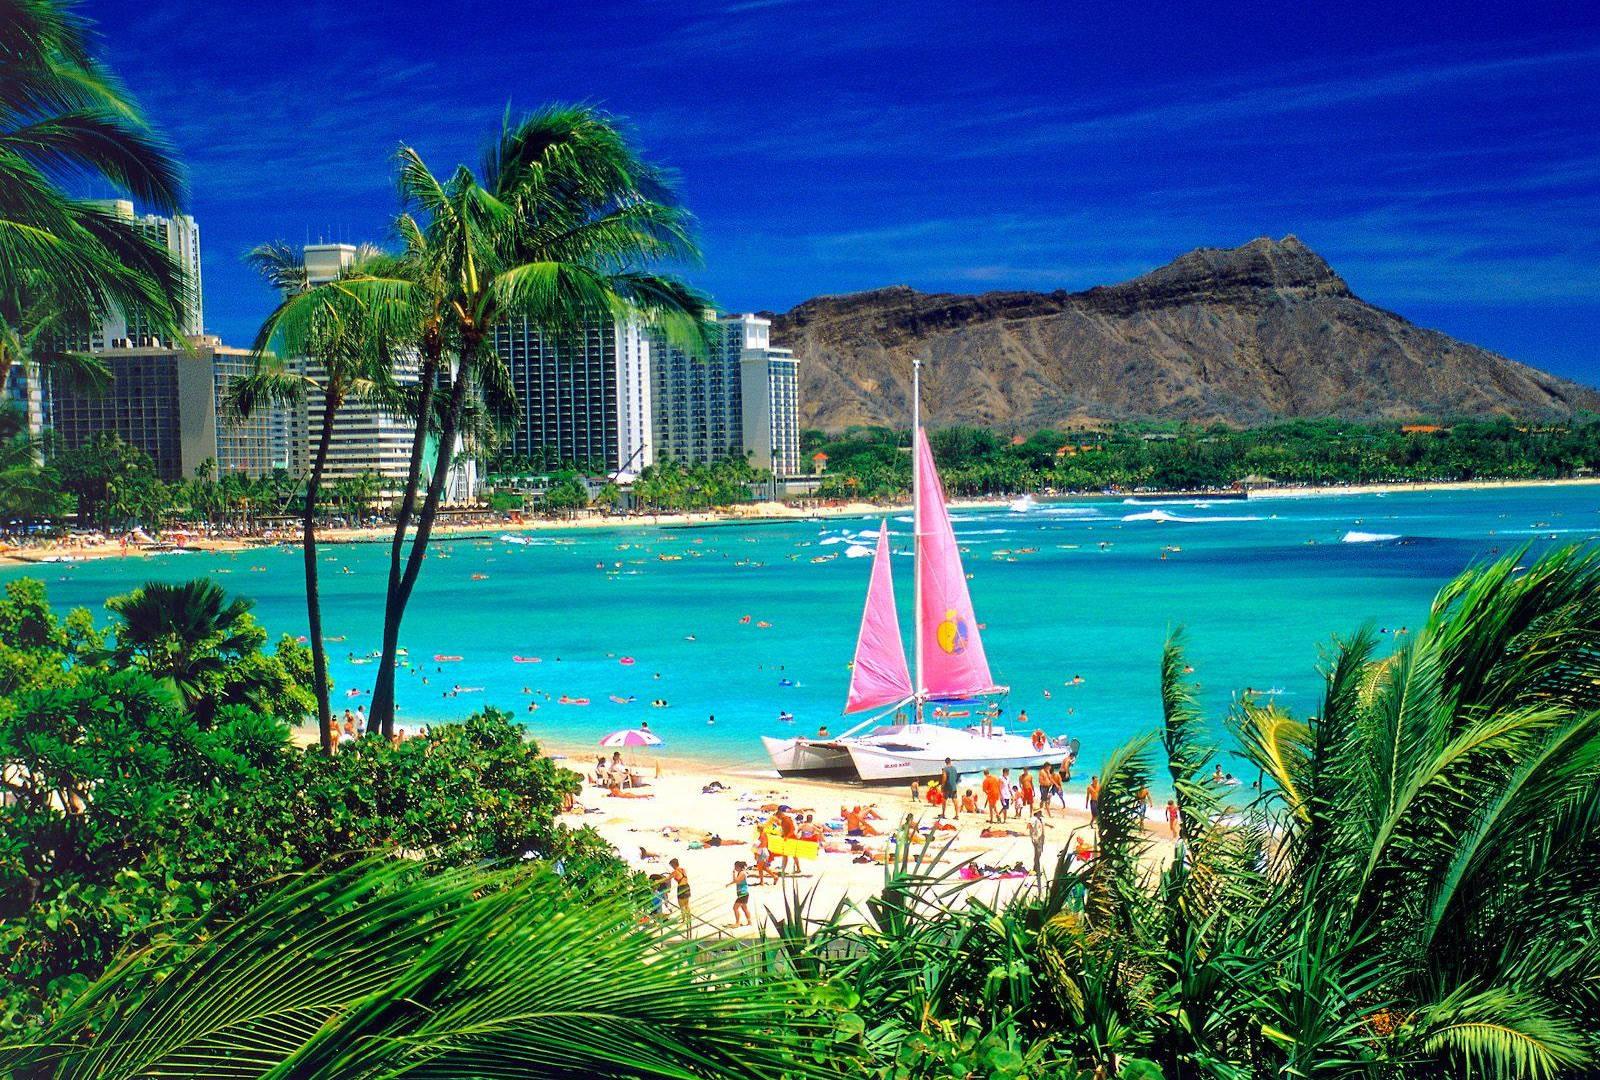 Waikiki beach picture.jpg